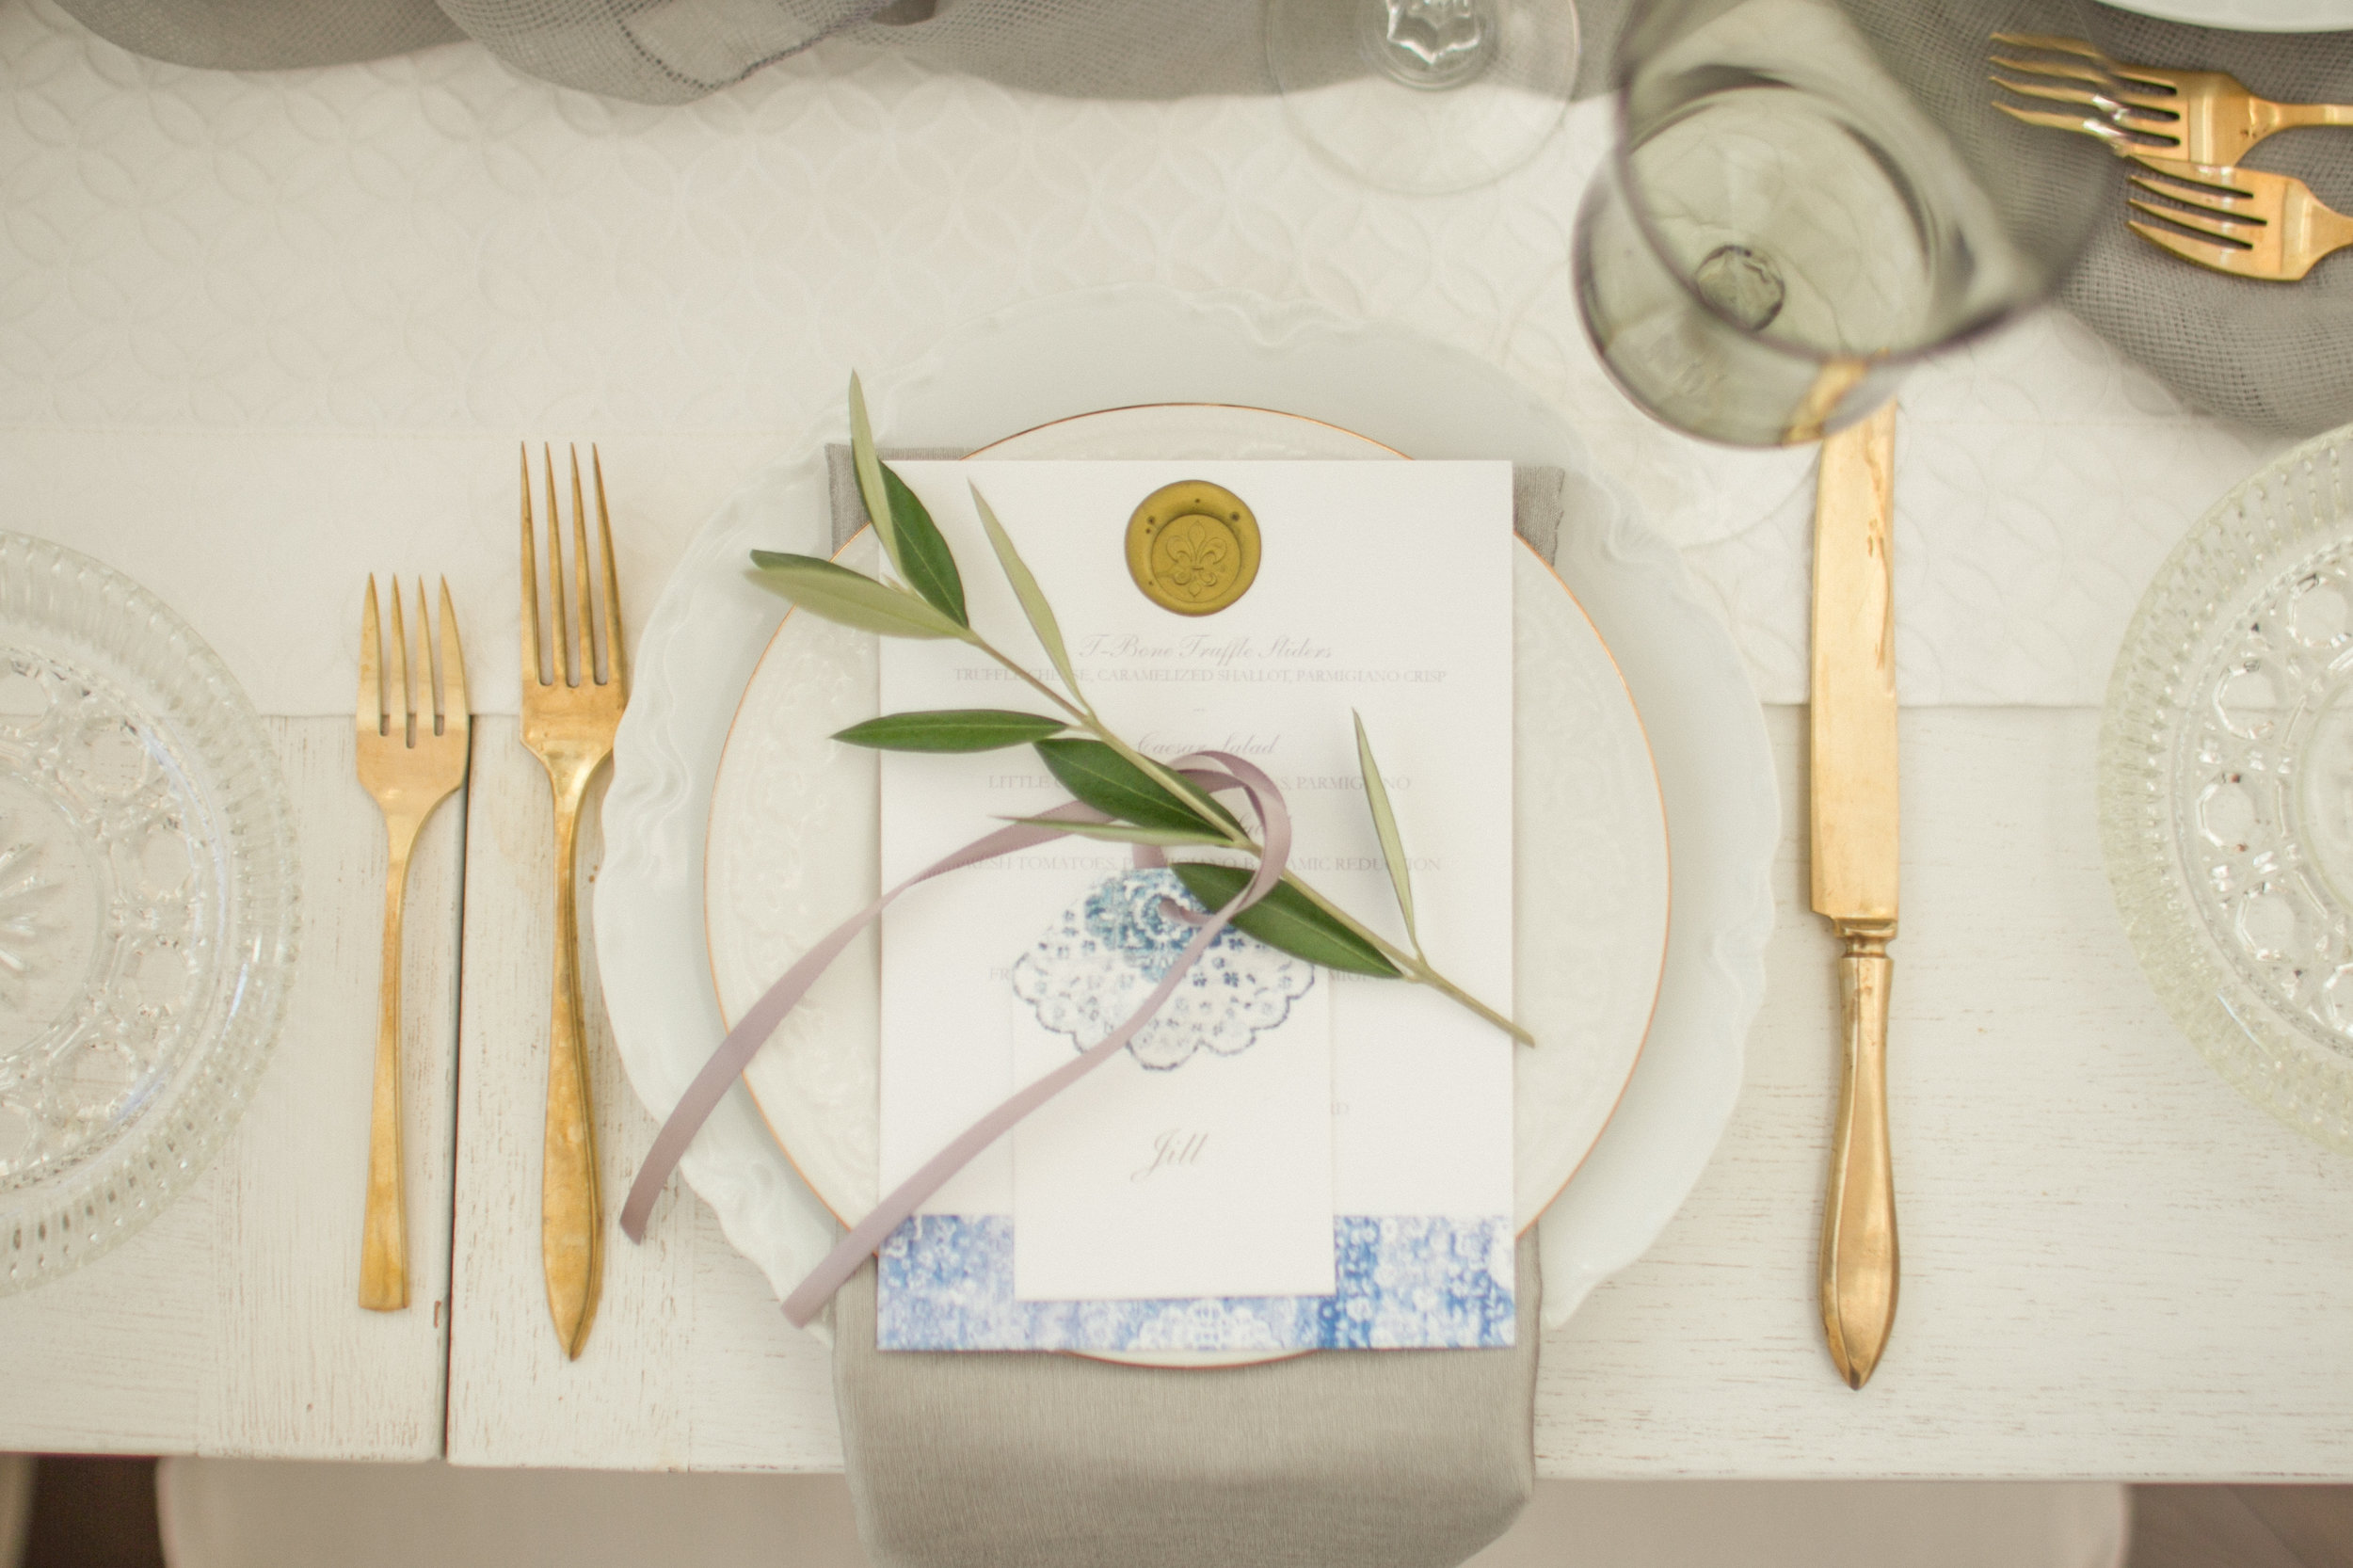 www.santabarbarawedding.com | Atelier de La Fleur Weddings & Events | Mike Larson | Reception Place Setting